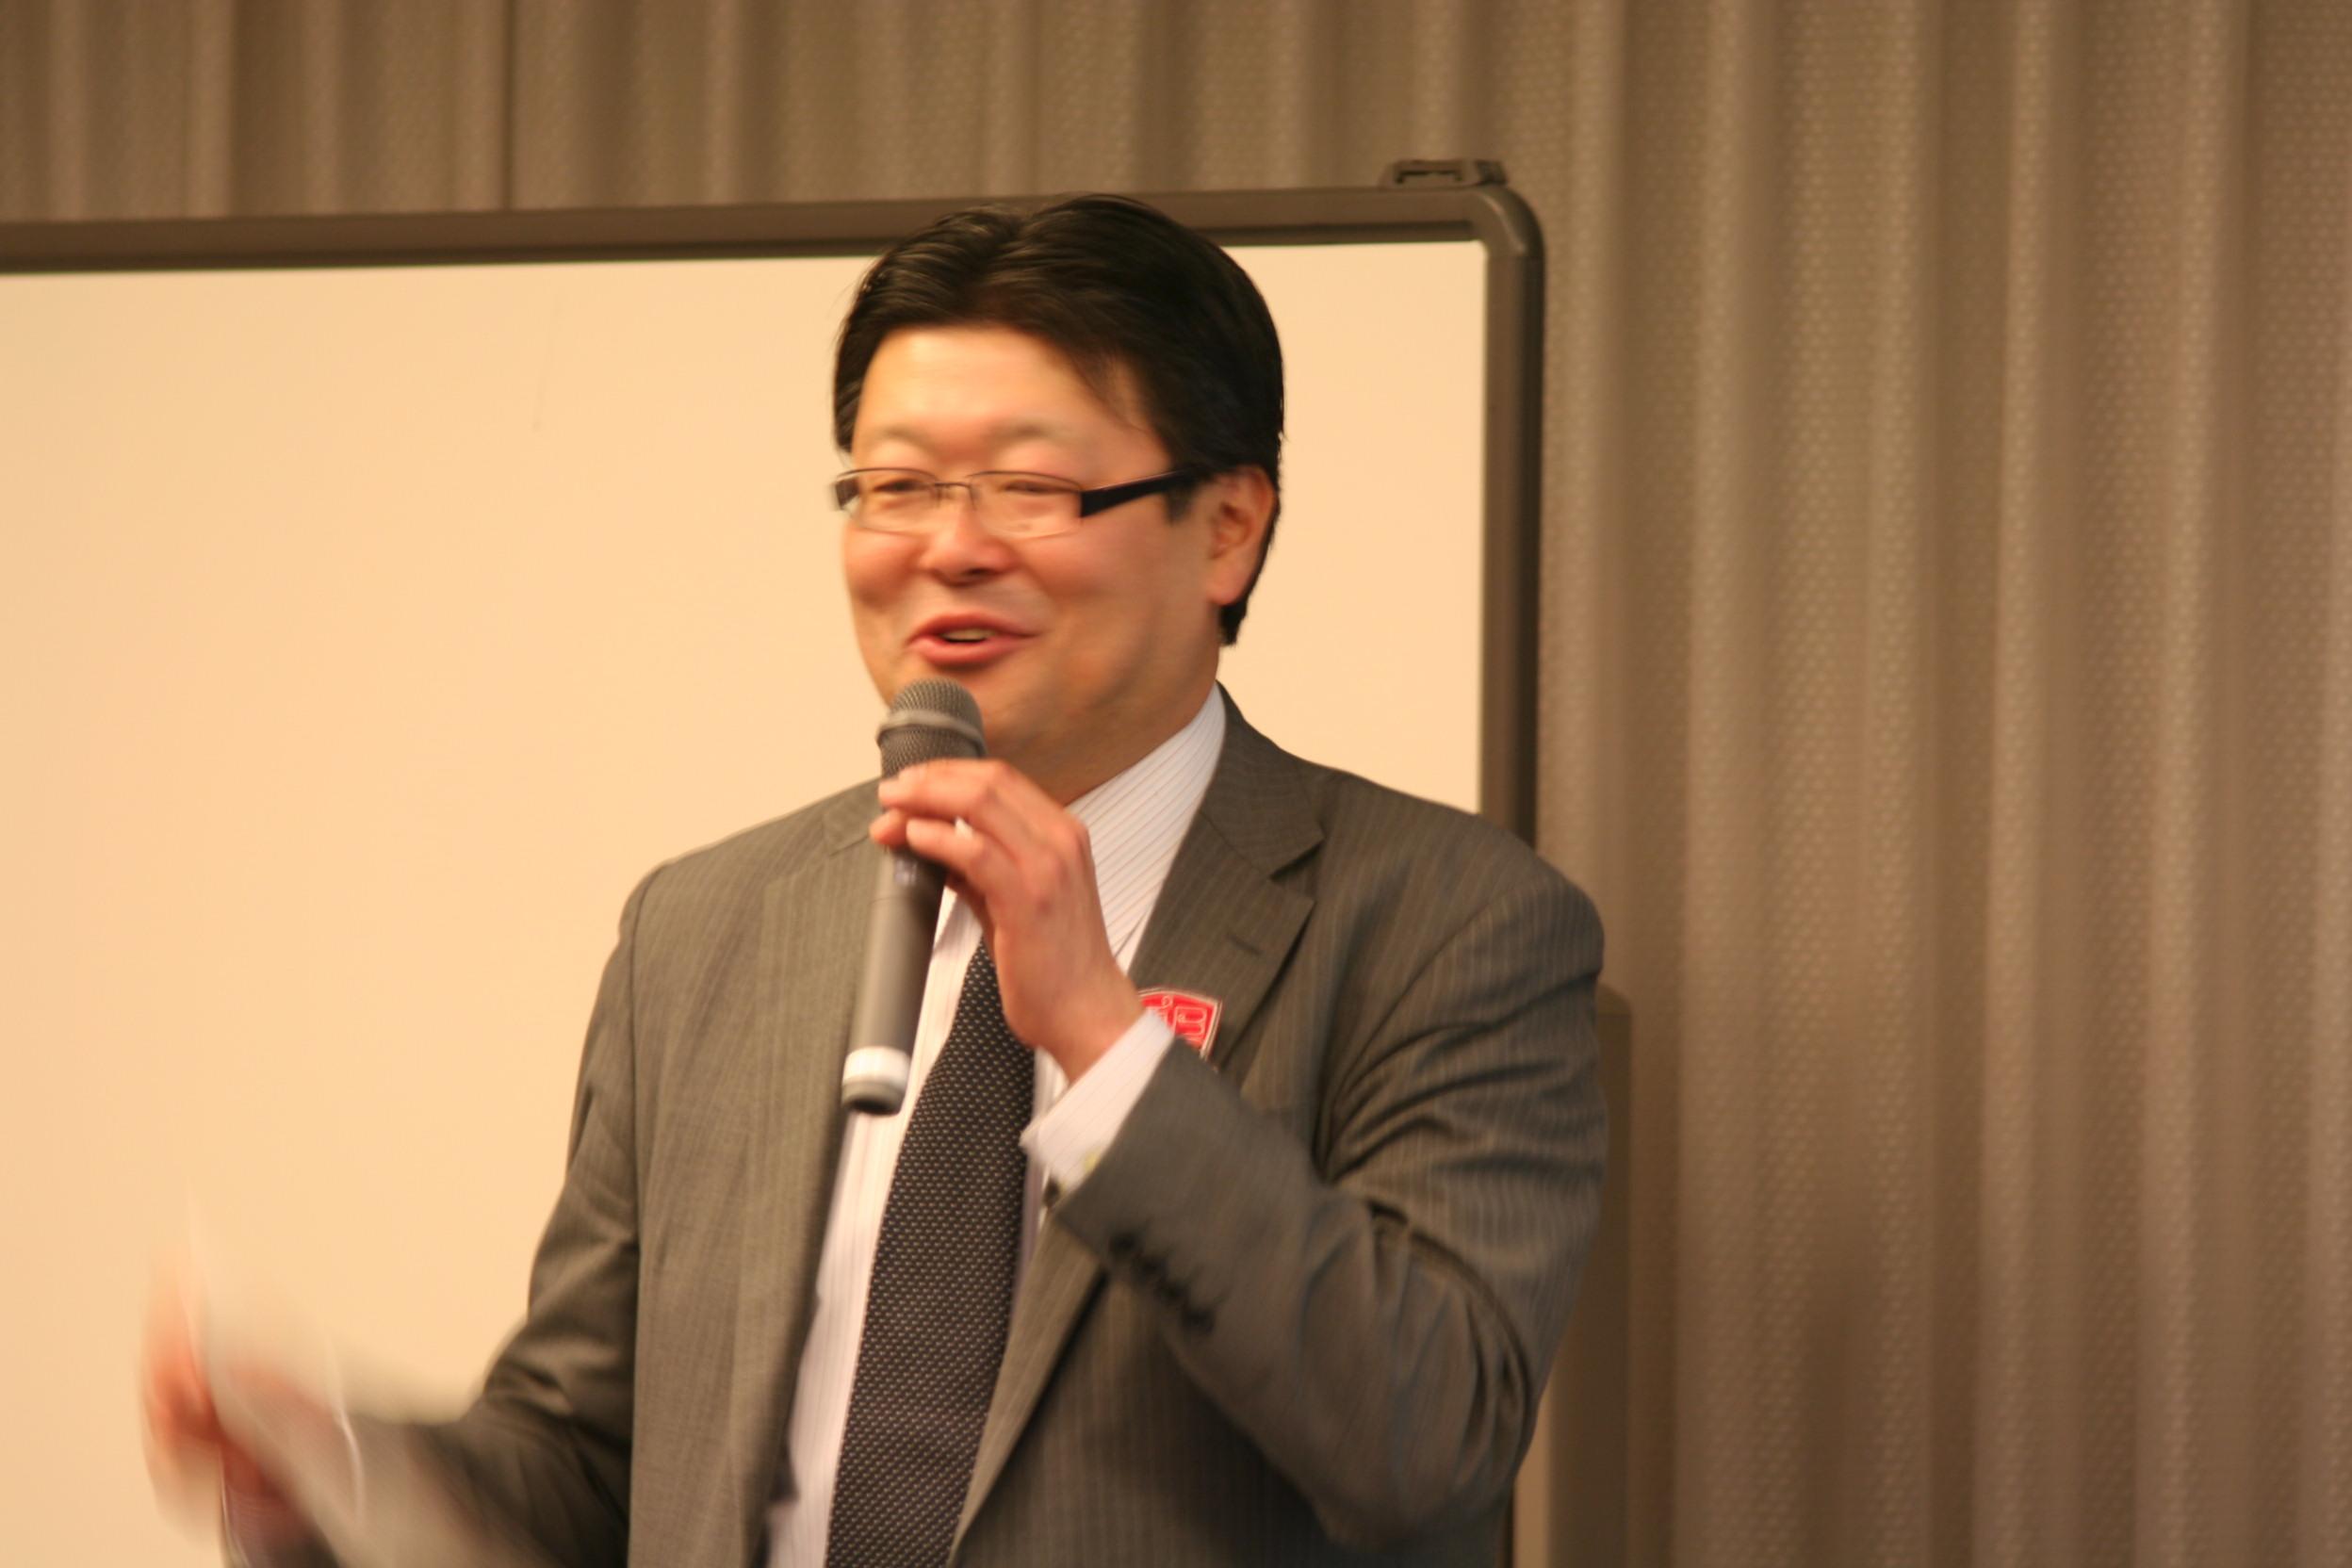 講師の俵慎一先生